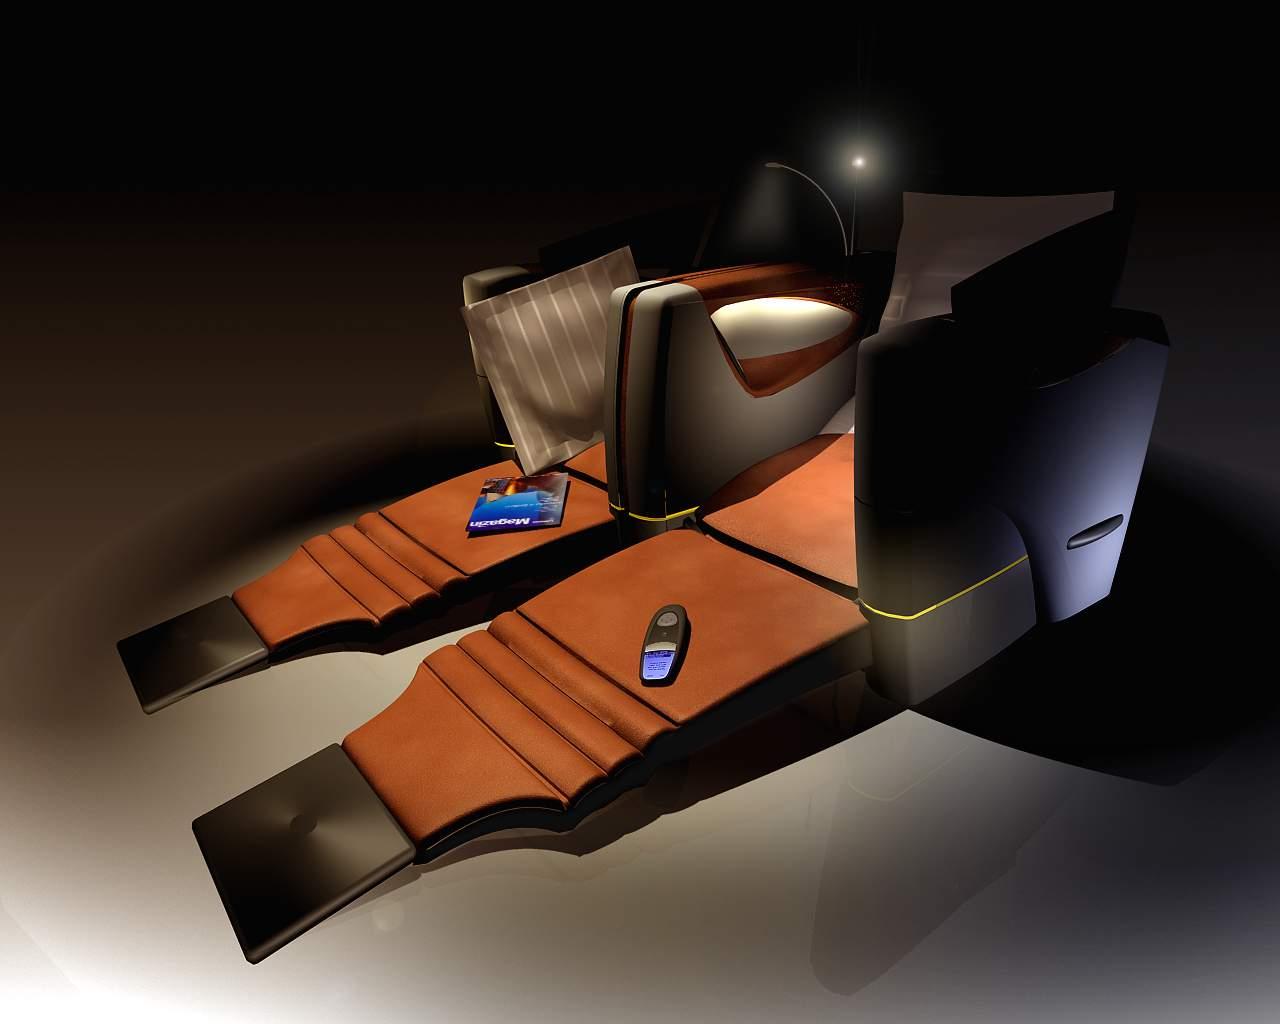 Lufthansa Business ClassSeat